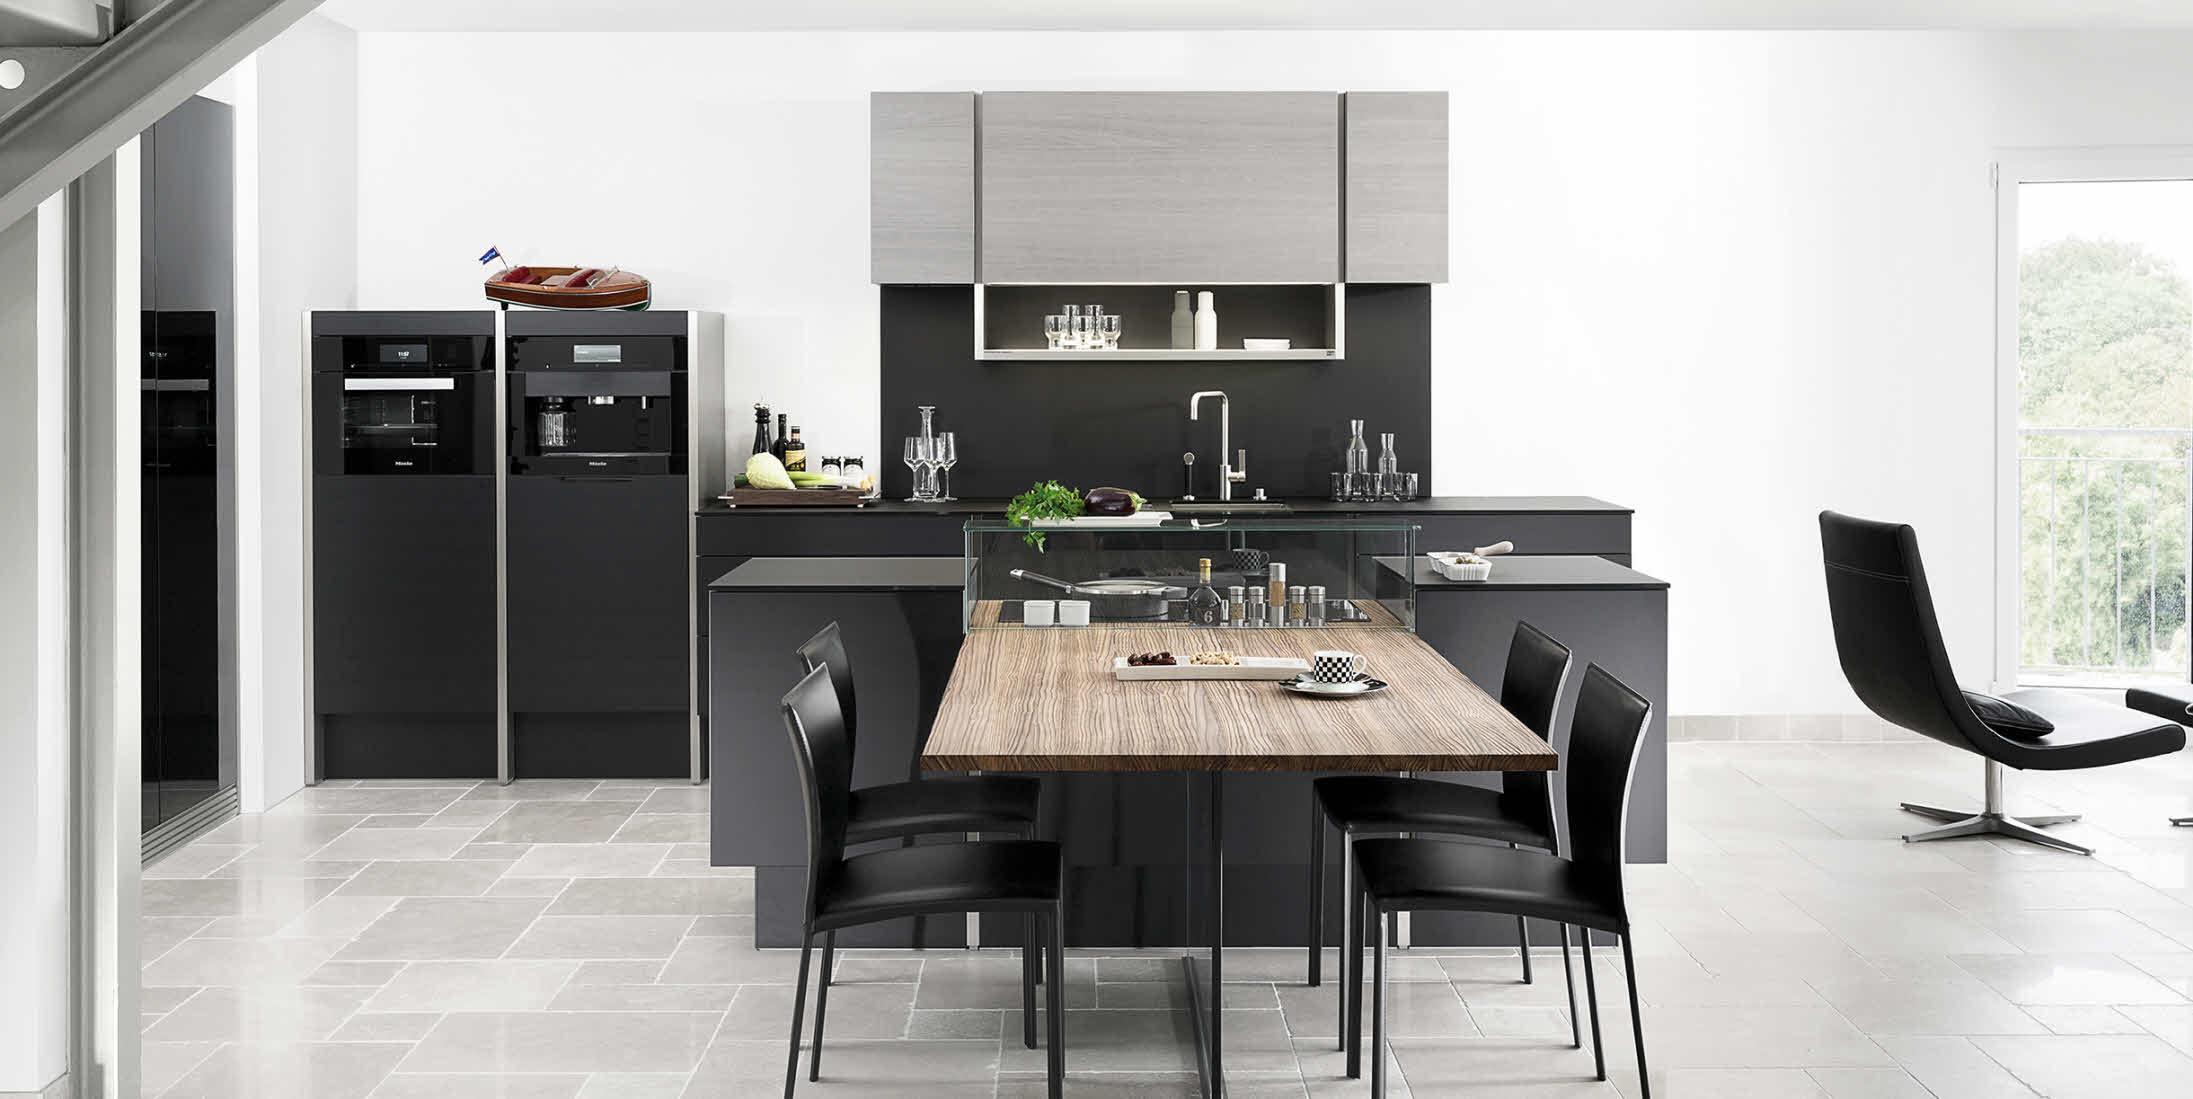 Porsche Design Keuken : Porsche design keuken